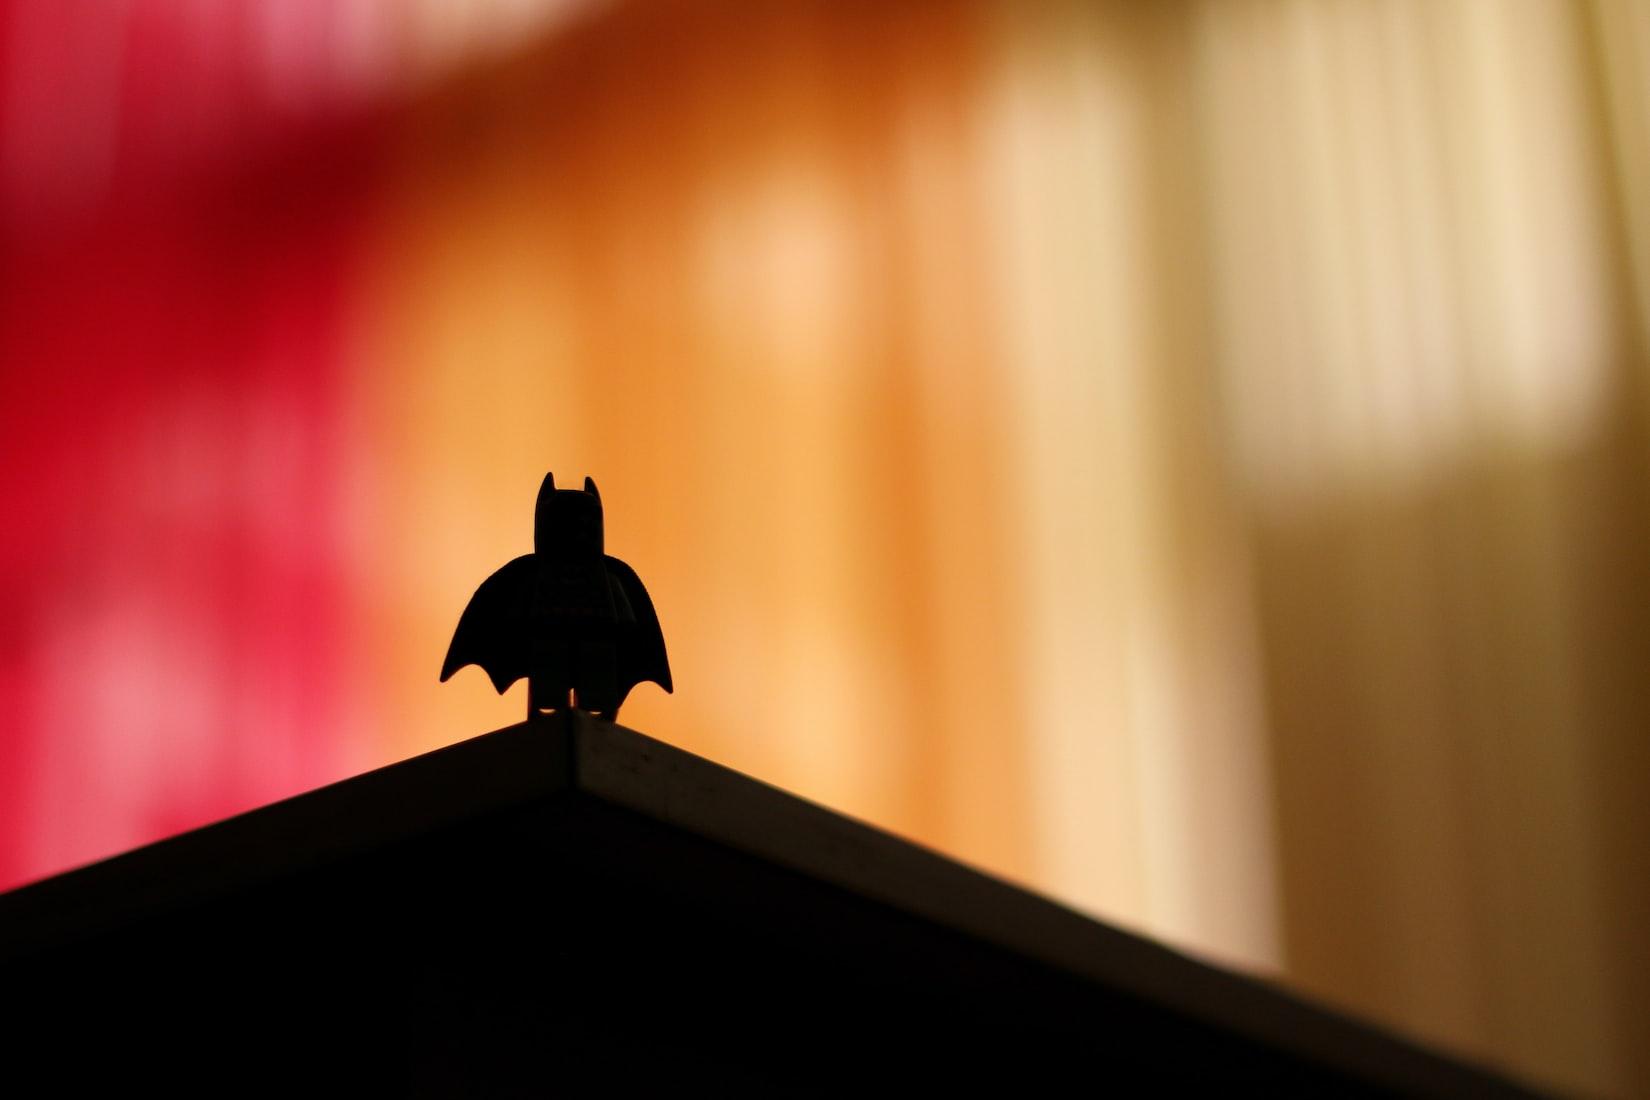 Silhouette of a Lego Batman